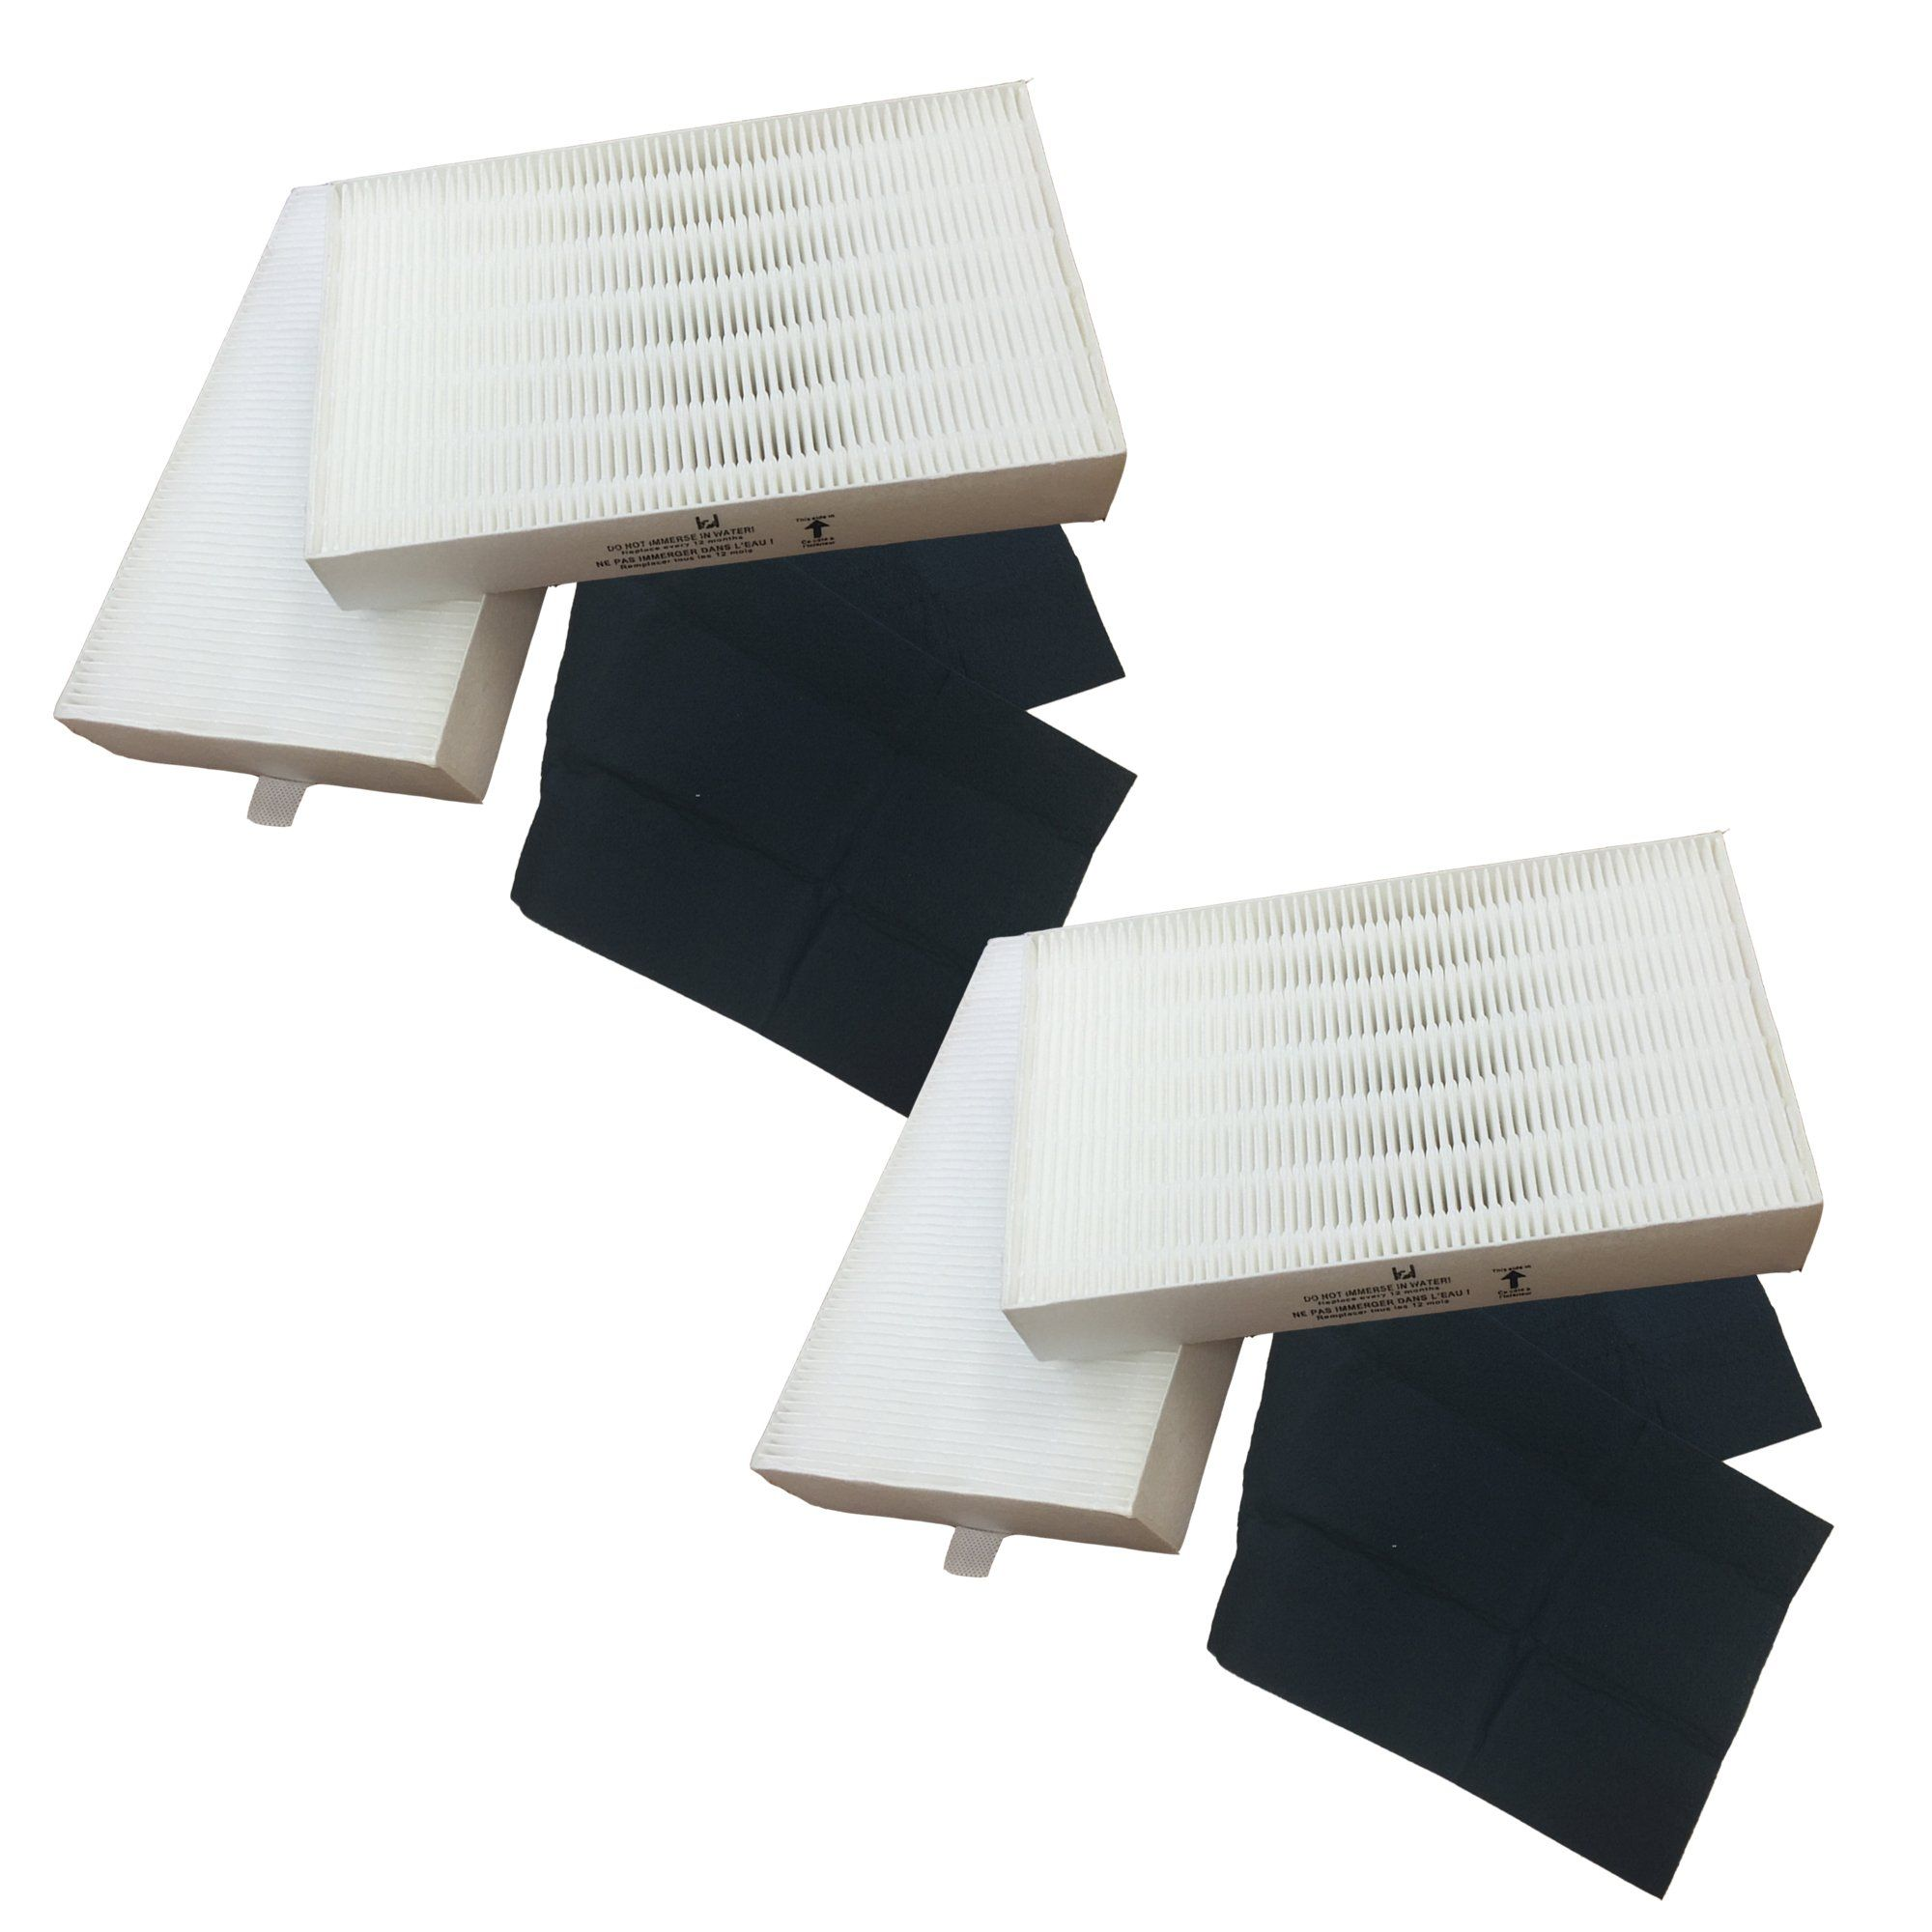 Replacement Carbon Filter & R Air Purifier Filter Kit